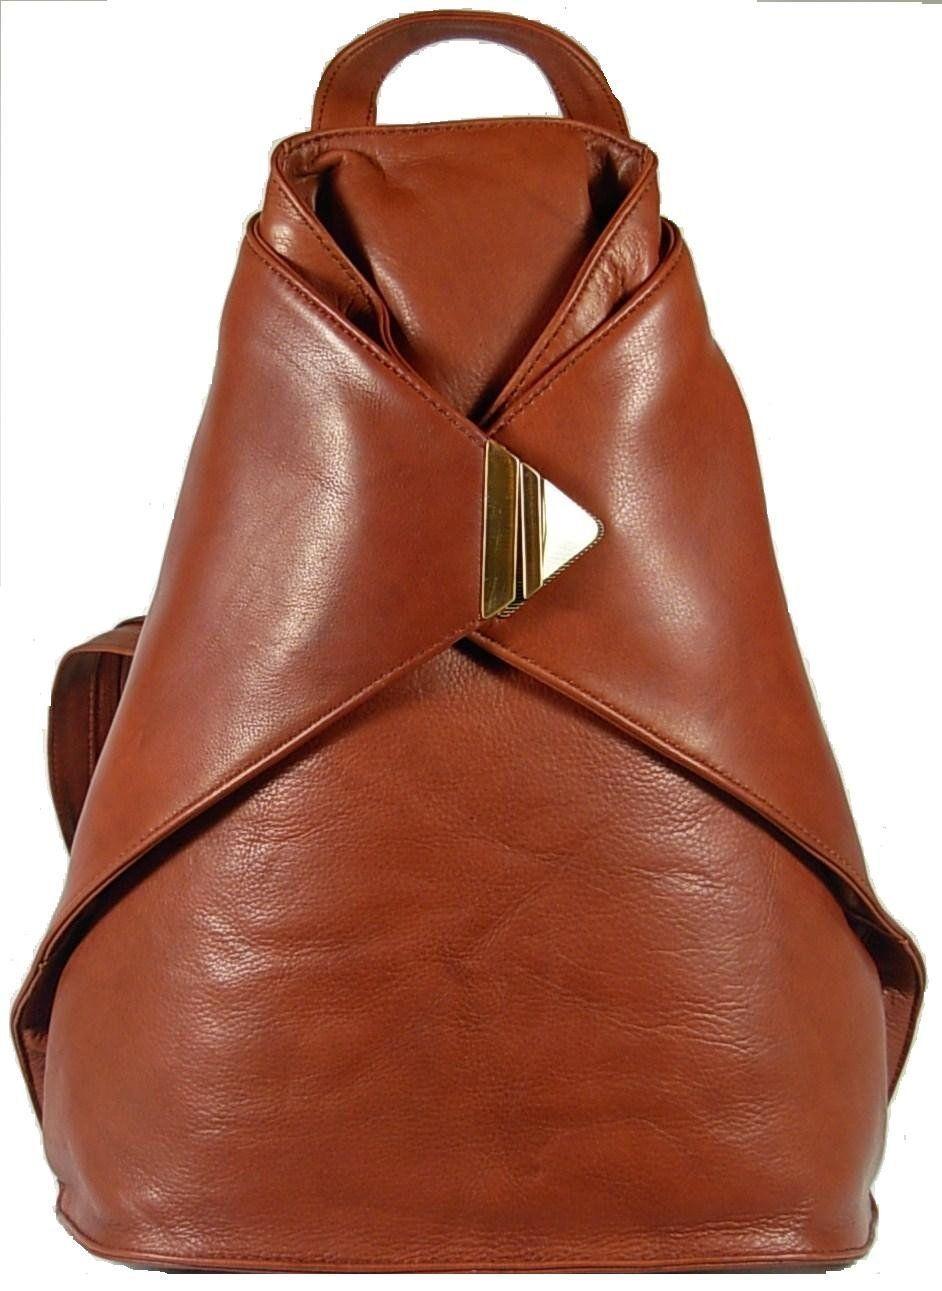 Visconti 18258 Large Stylish Las Triangular Soft Leather Backpack Rucksack Handbag For Women Brown